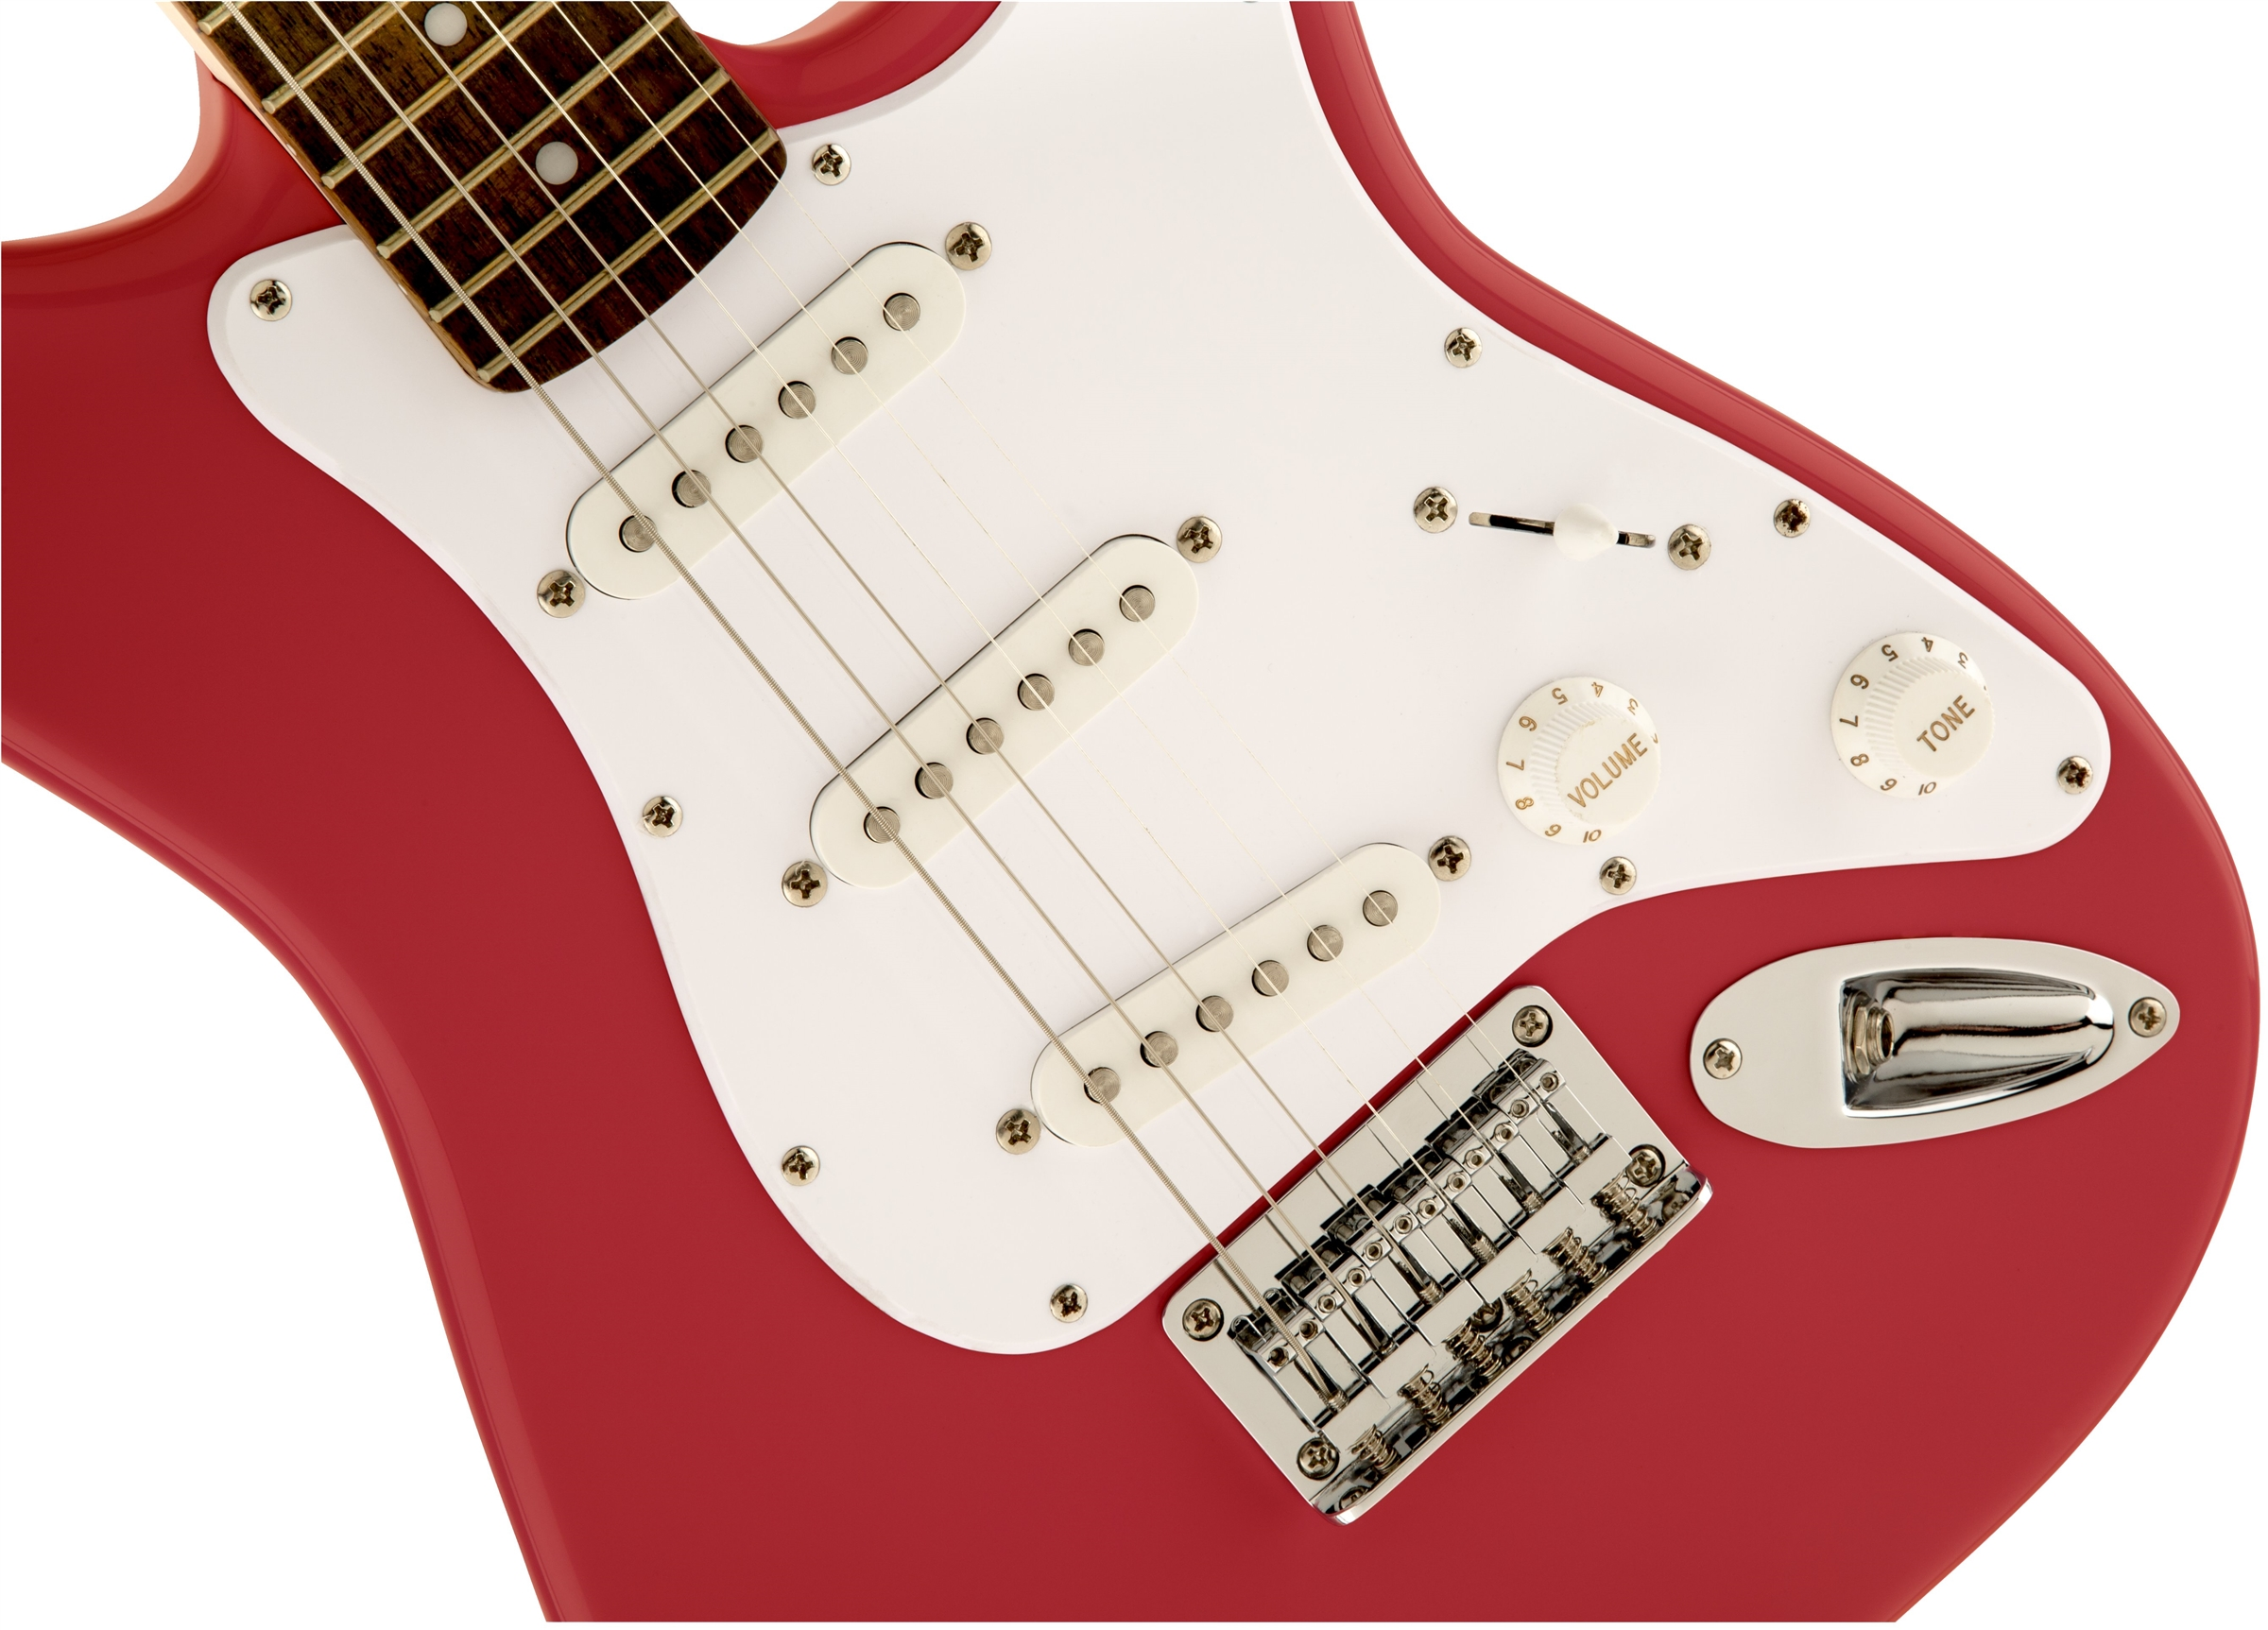 squier by fender mini strat electric guitar torino red w amp 717669176853 ebay. Black Bedroom Furniture Sets. Home Design Ideas